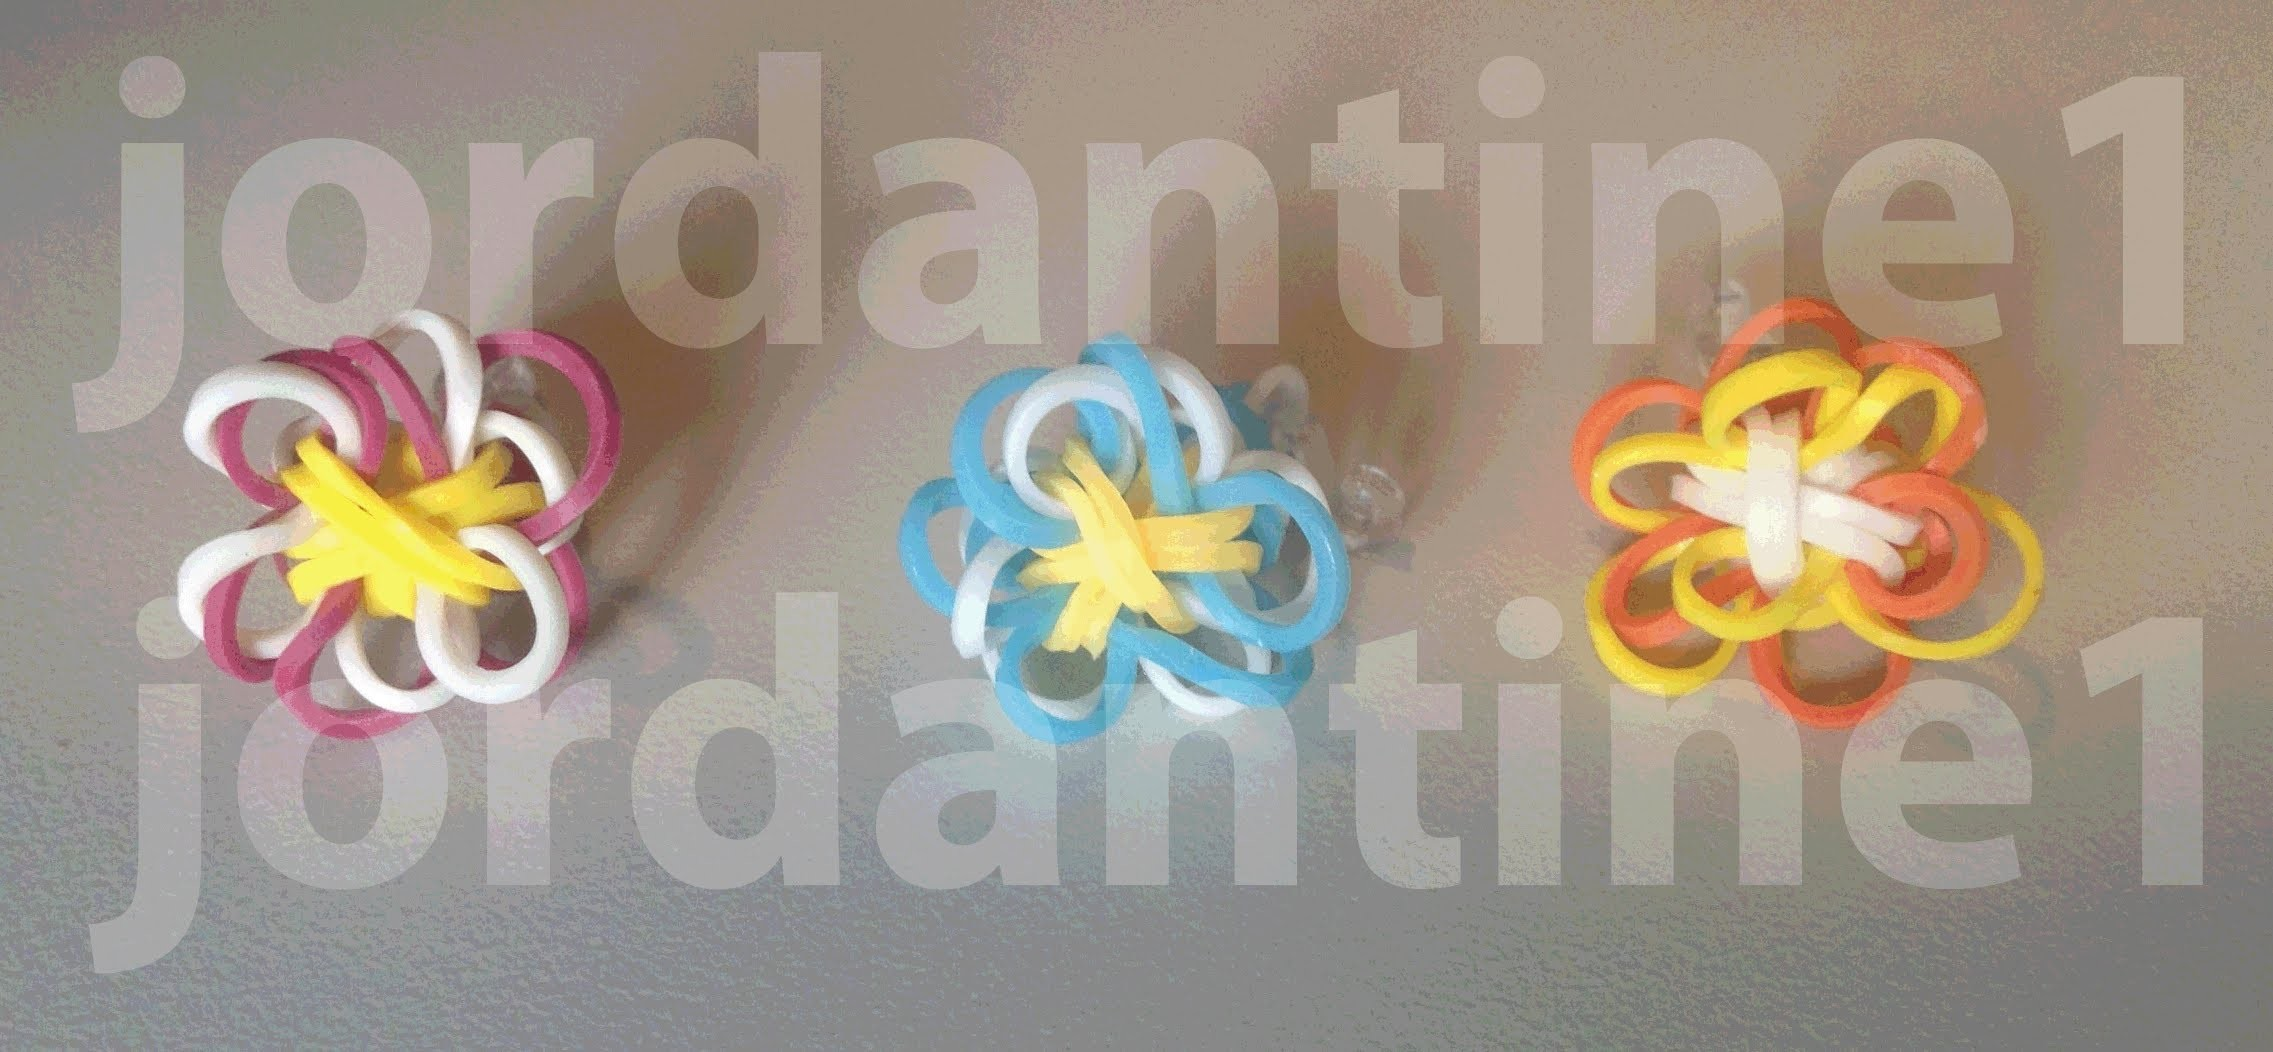 Two Color Flower Fun Charm - New Updated Version - Rainbow Loom, Crazy Loom, Wonder Loom, Bandaloom